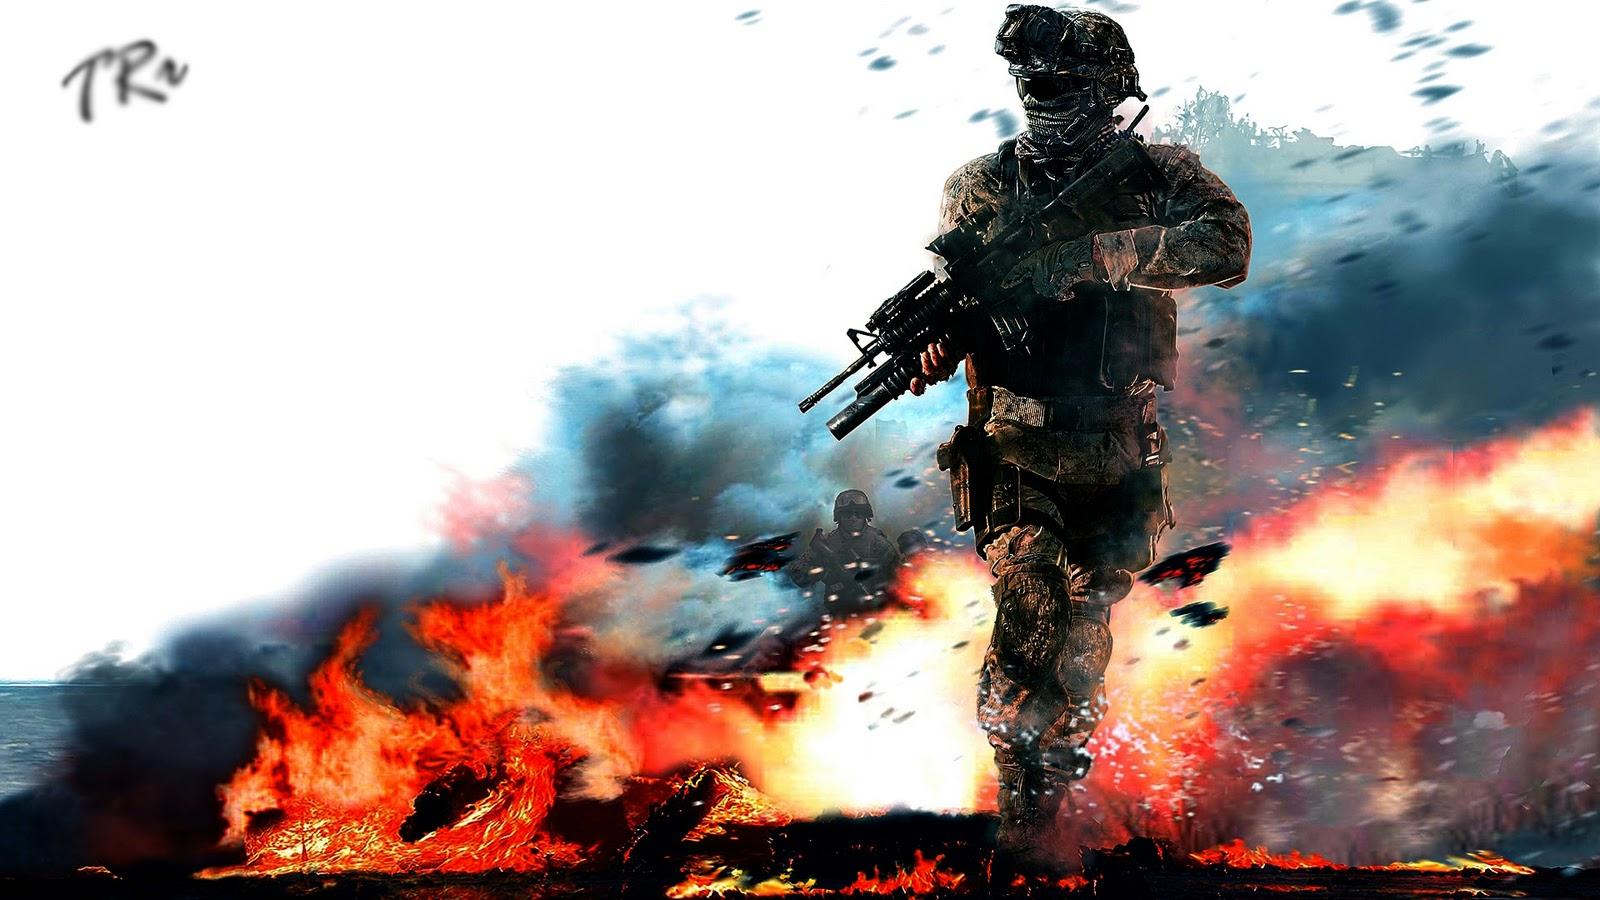 Call of Duty Black Ops │HD Wallpapers 1900x1200   Desktop ...